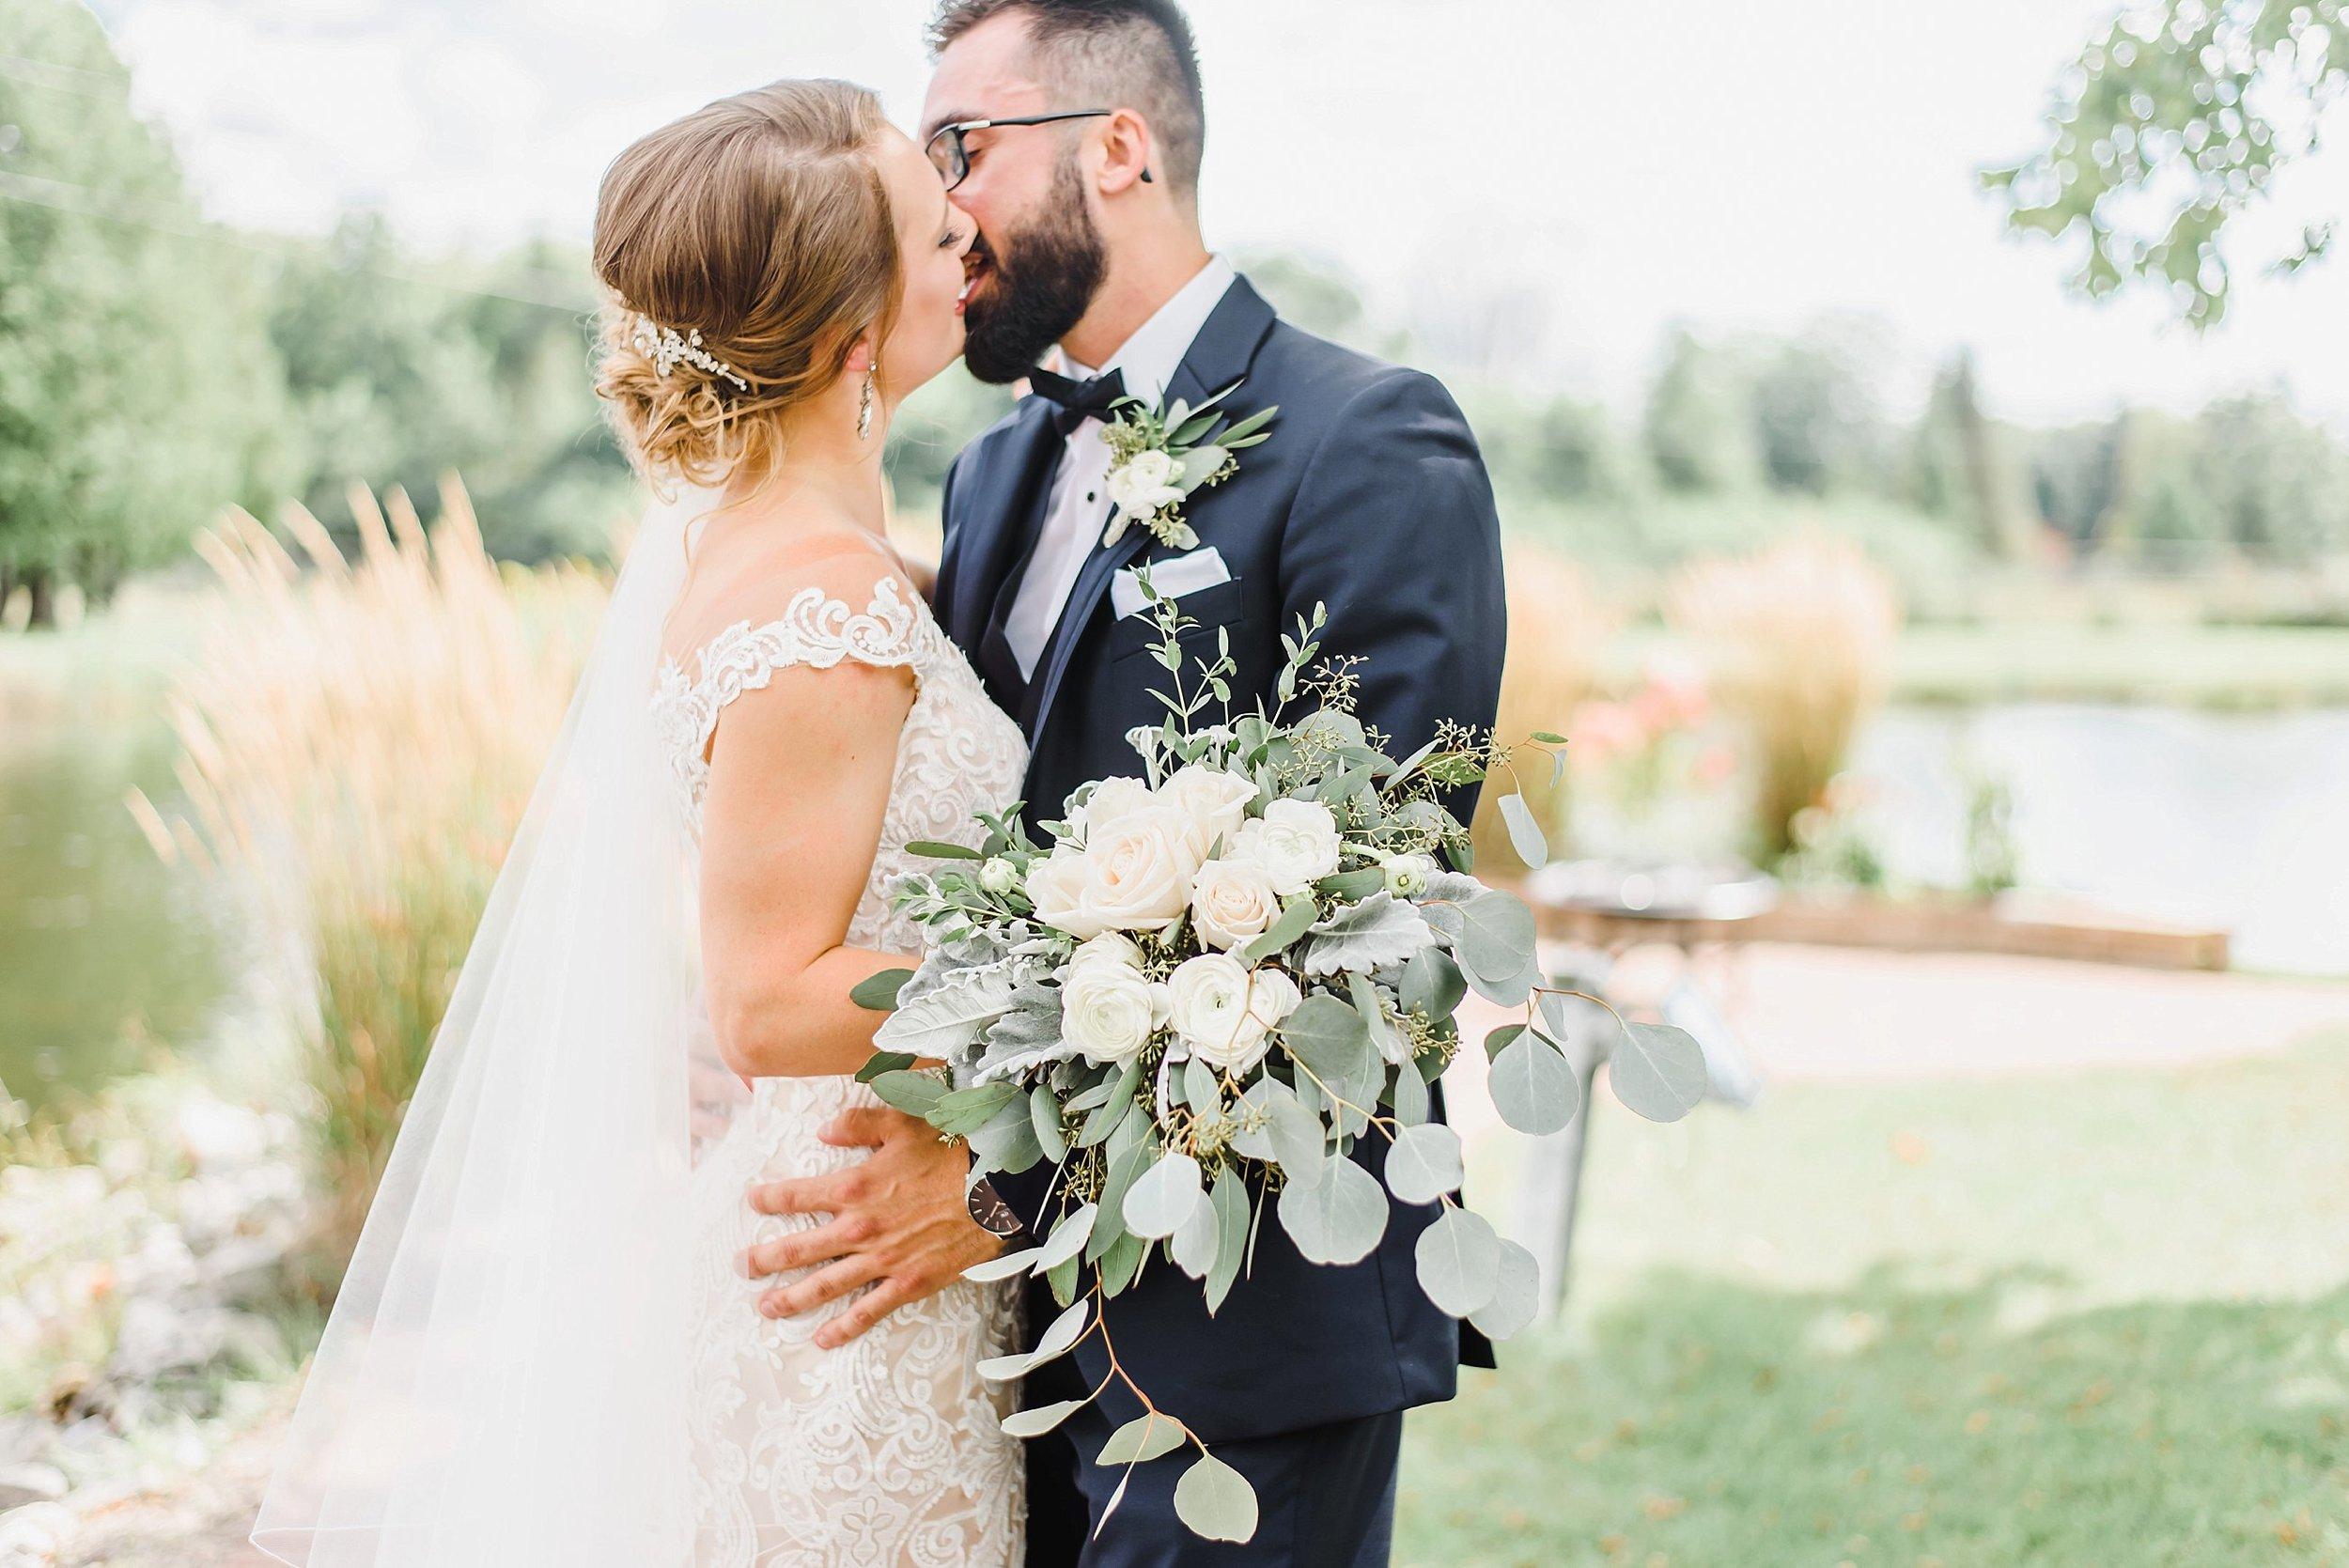 light airy indie fine art ottawa wedding photographer | Ali and Batoul Photography_1247.jpg